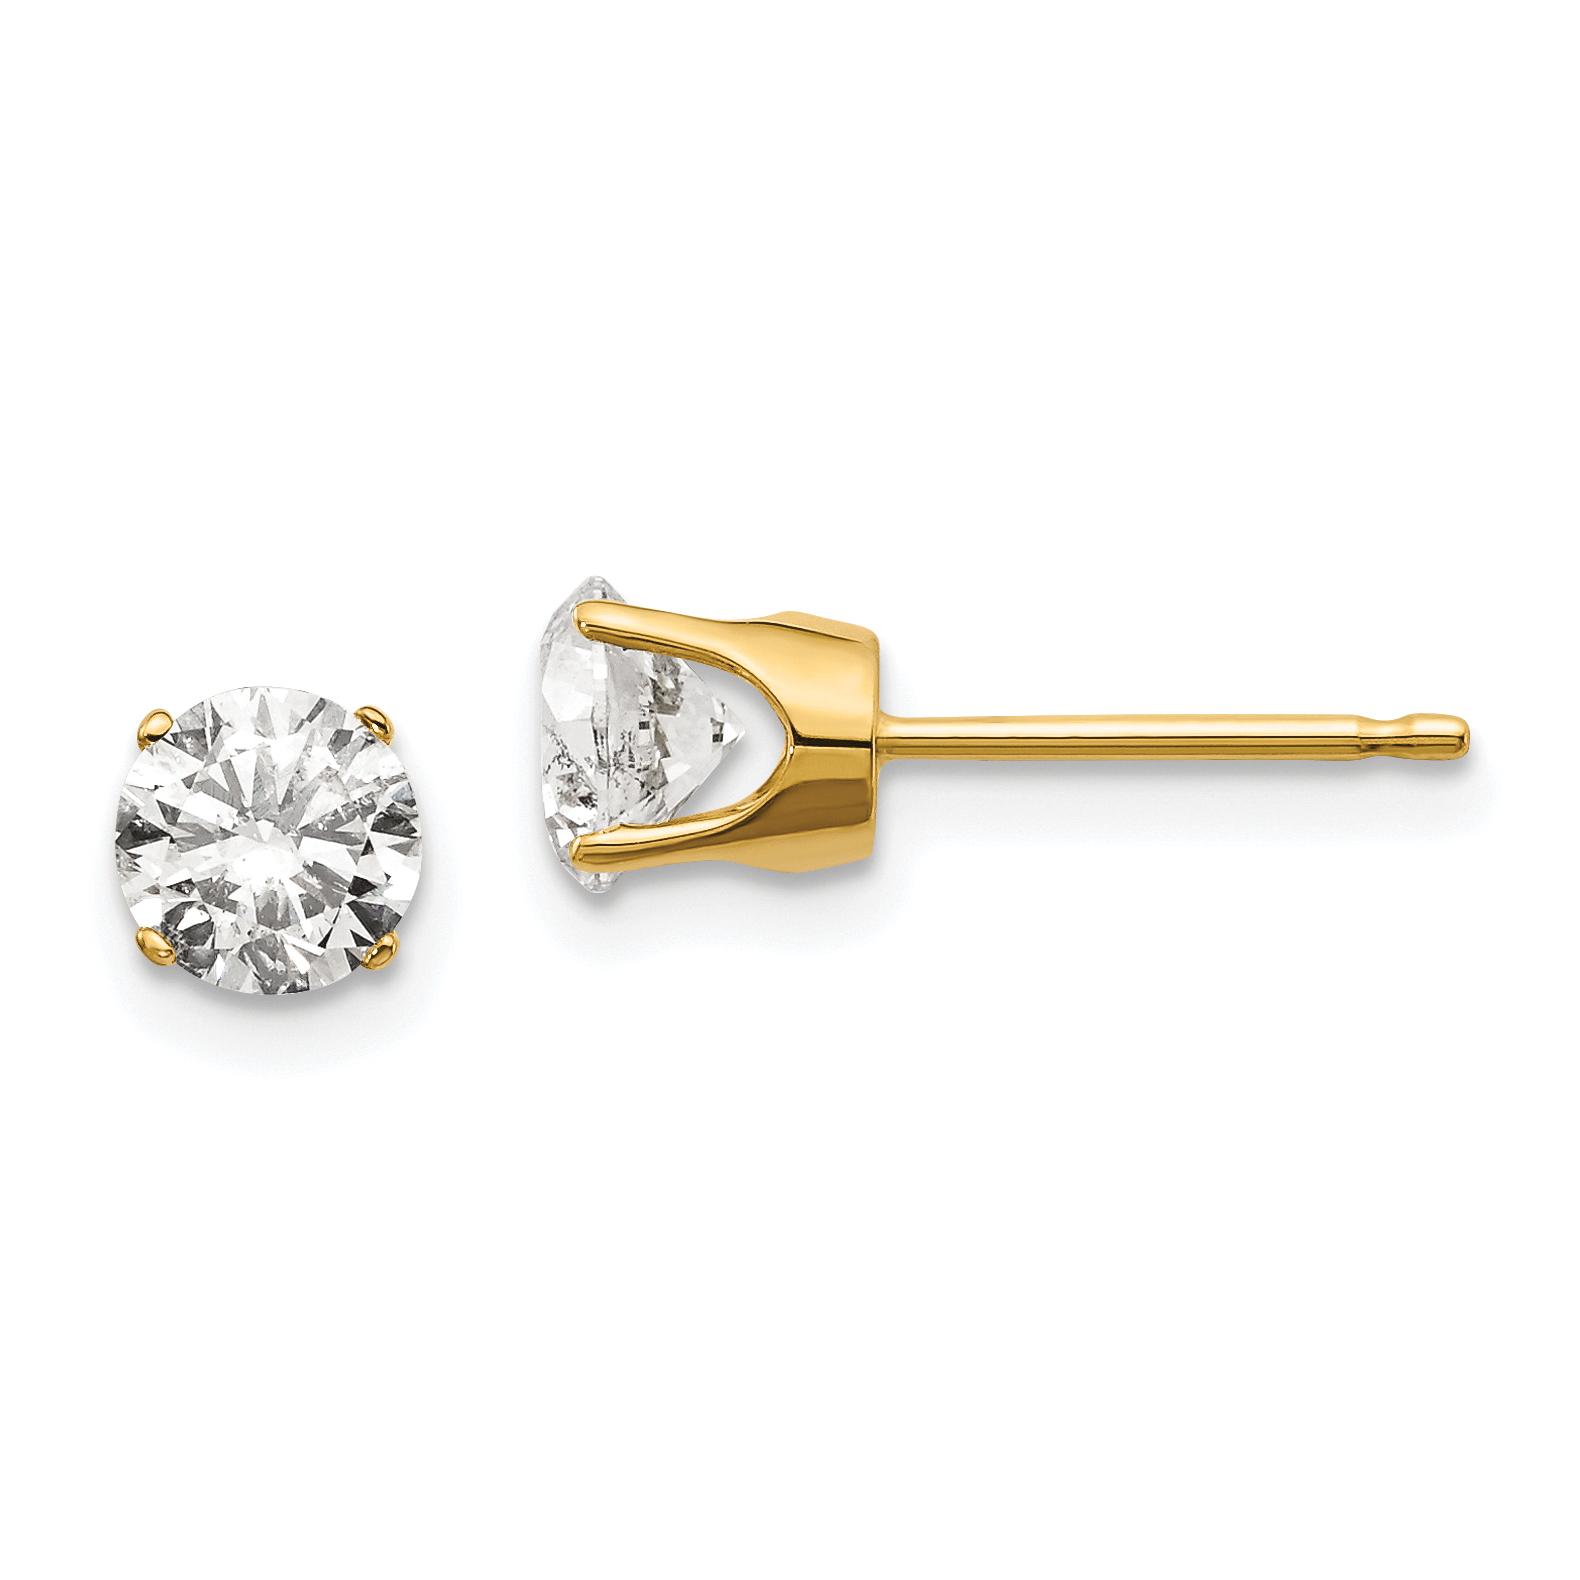 14ky 1.00ct. I2 K-L Diamond Stud Push-on Post Earrings